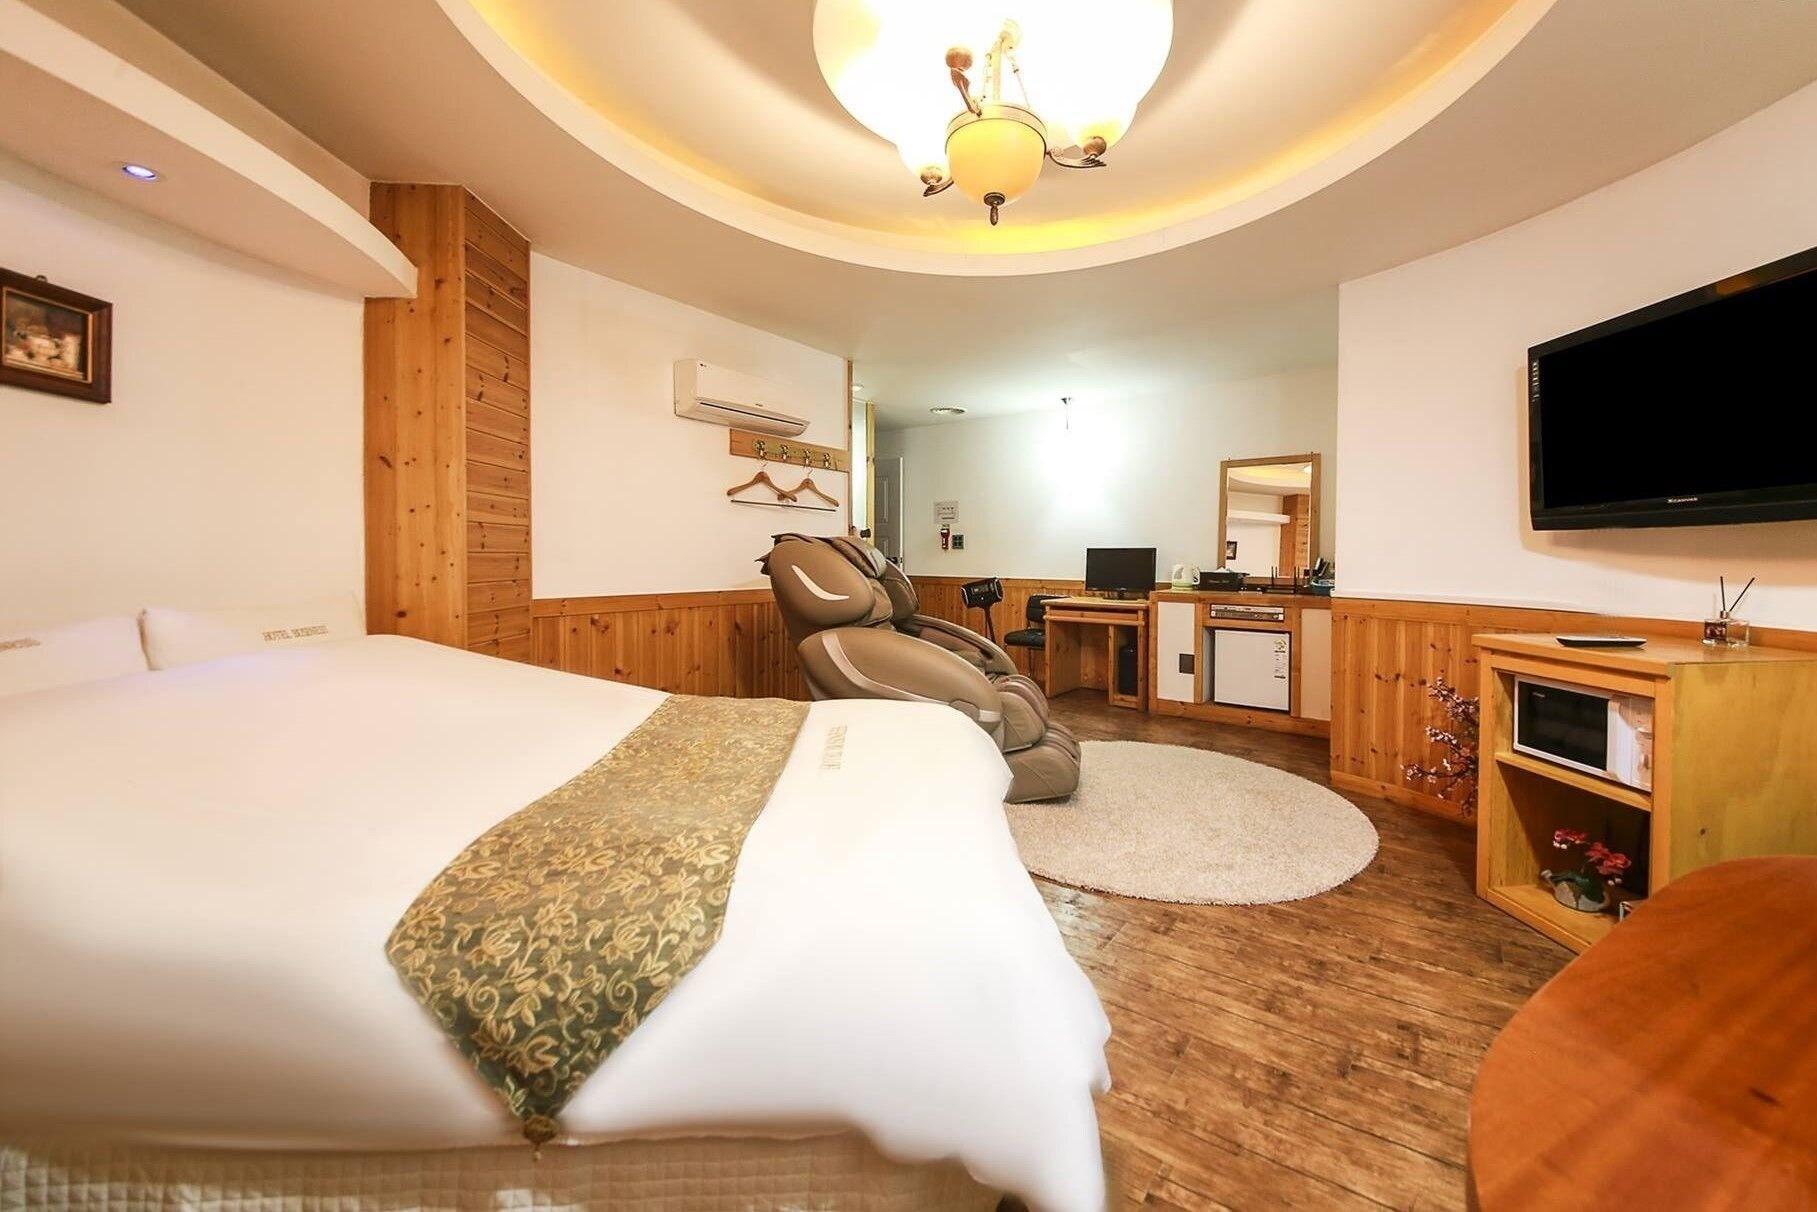 Business Hotel, Cheonan